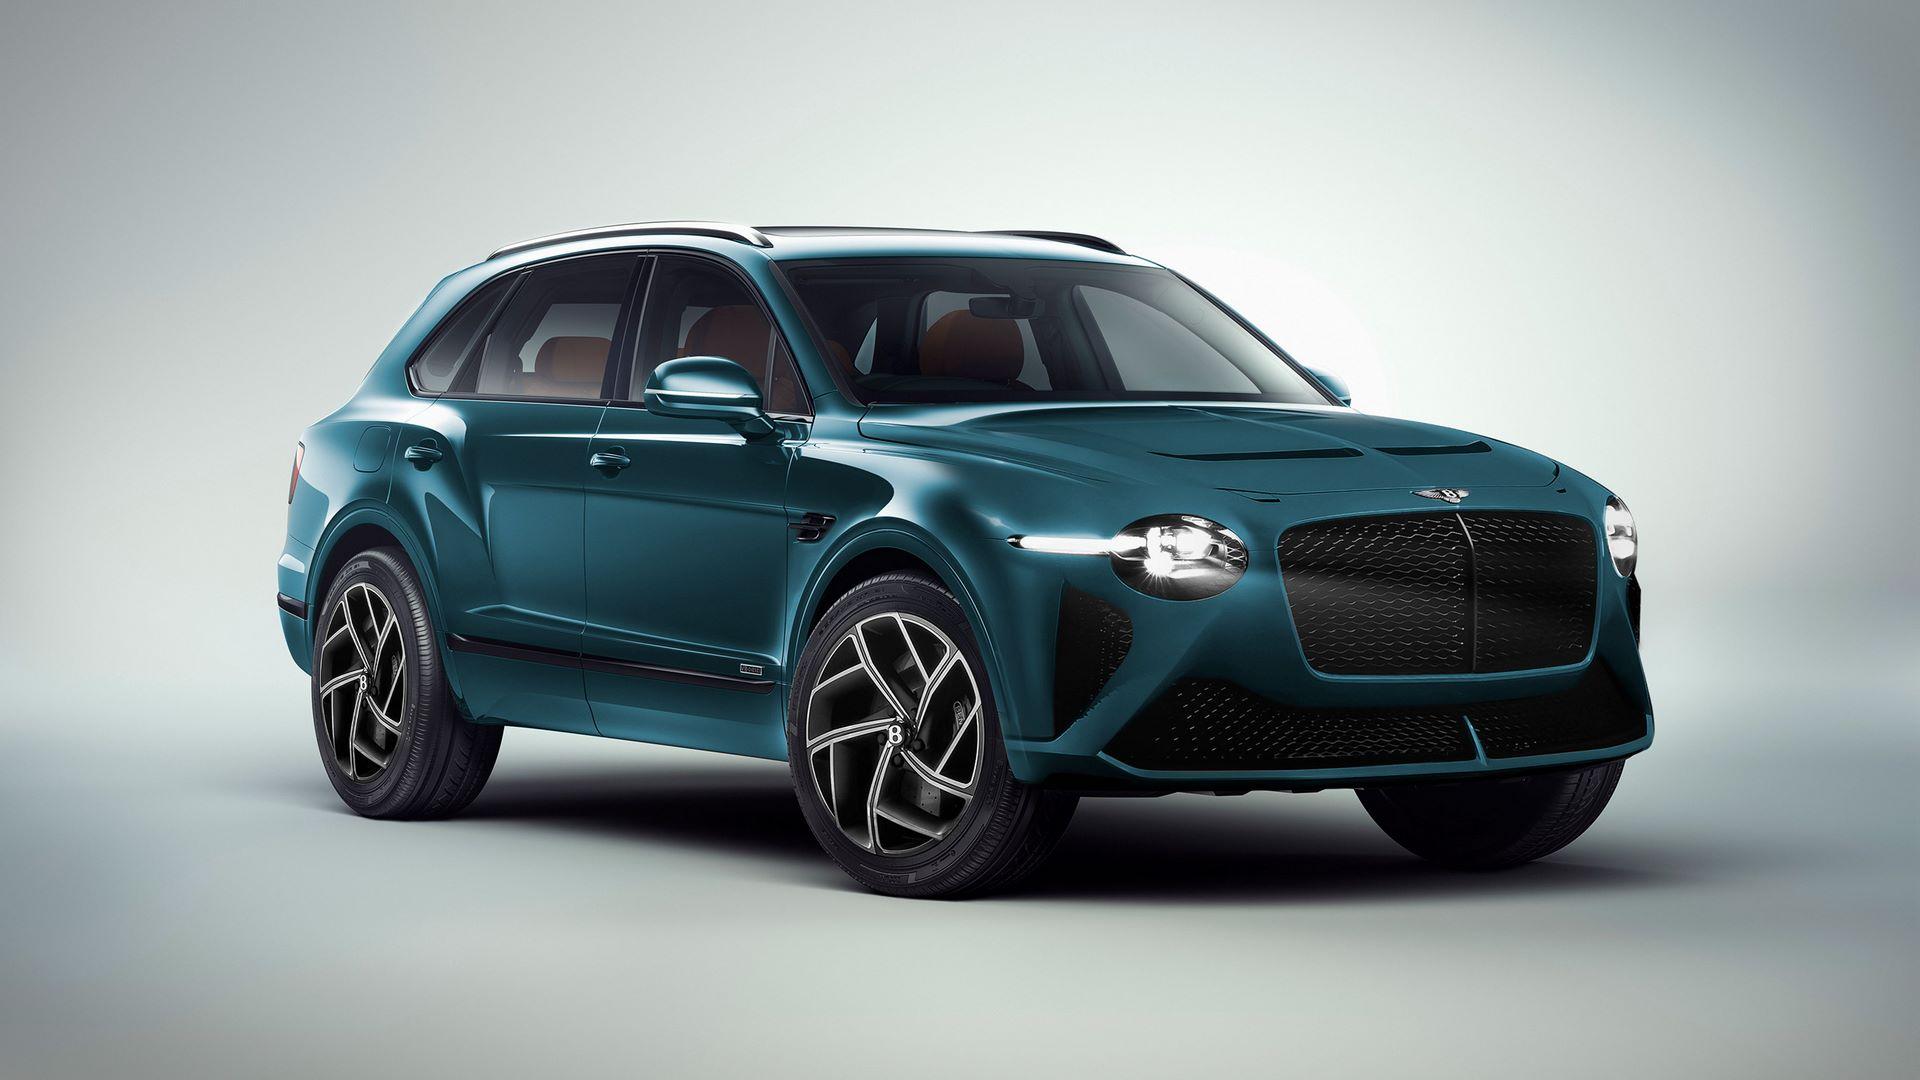 Bentley-Bentayga-facelift-2022-1